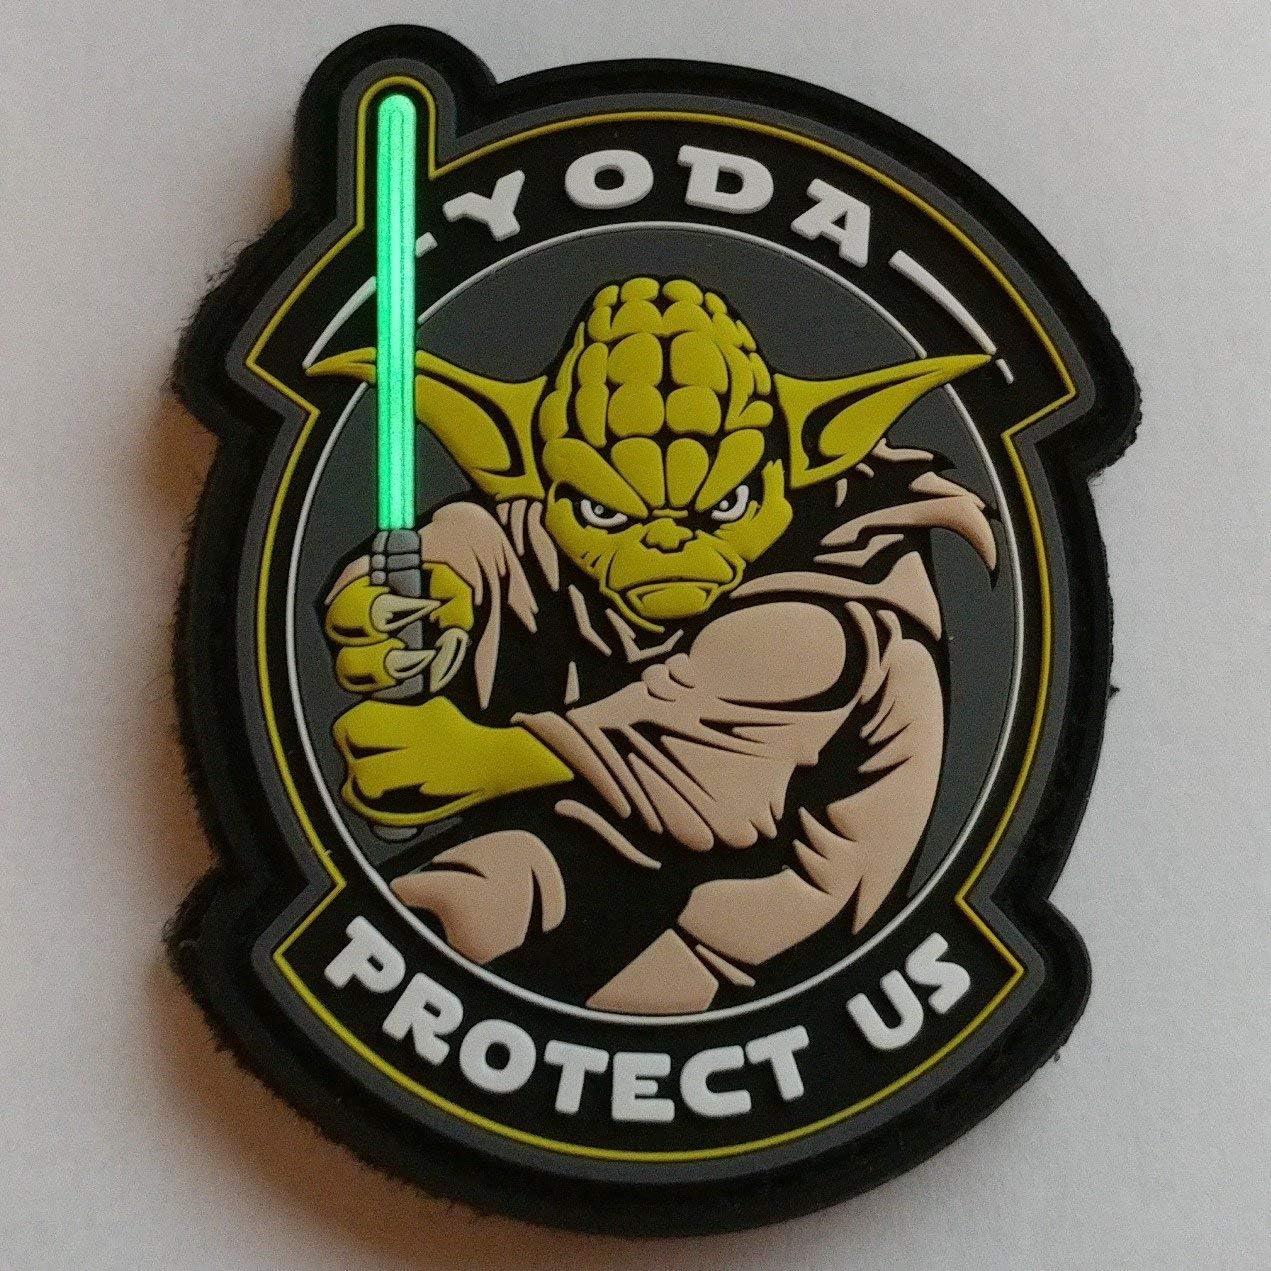 Velcro surface fastener patch Patch Star Wars Glow in the Dark